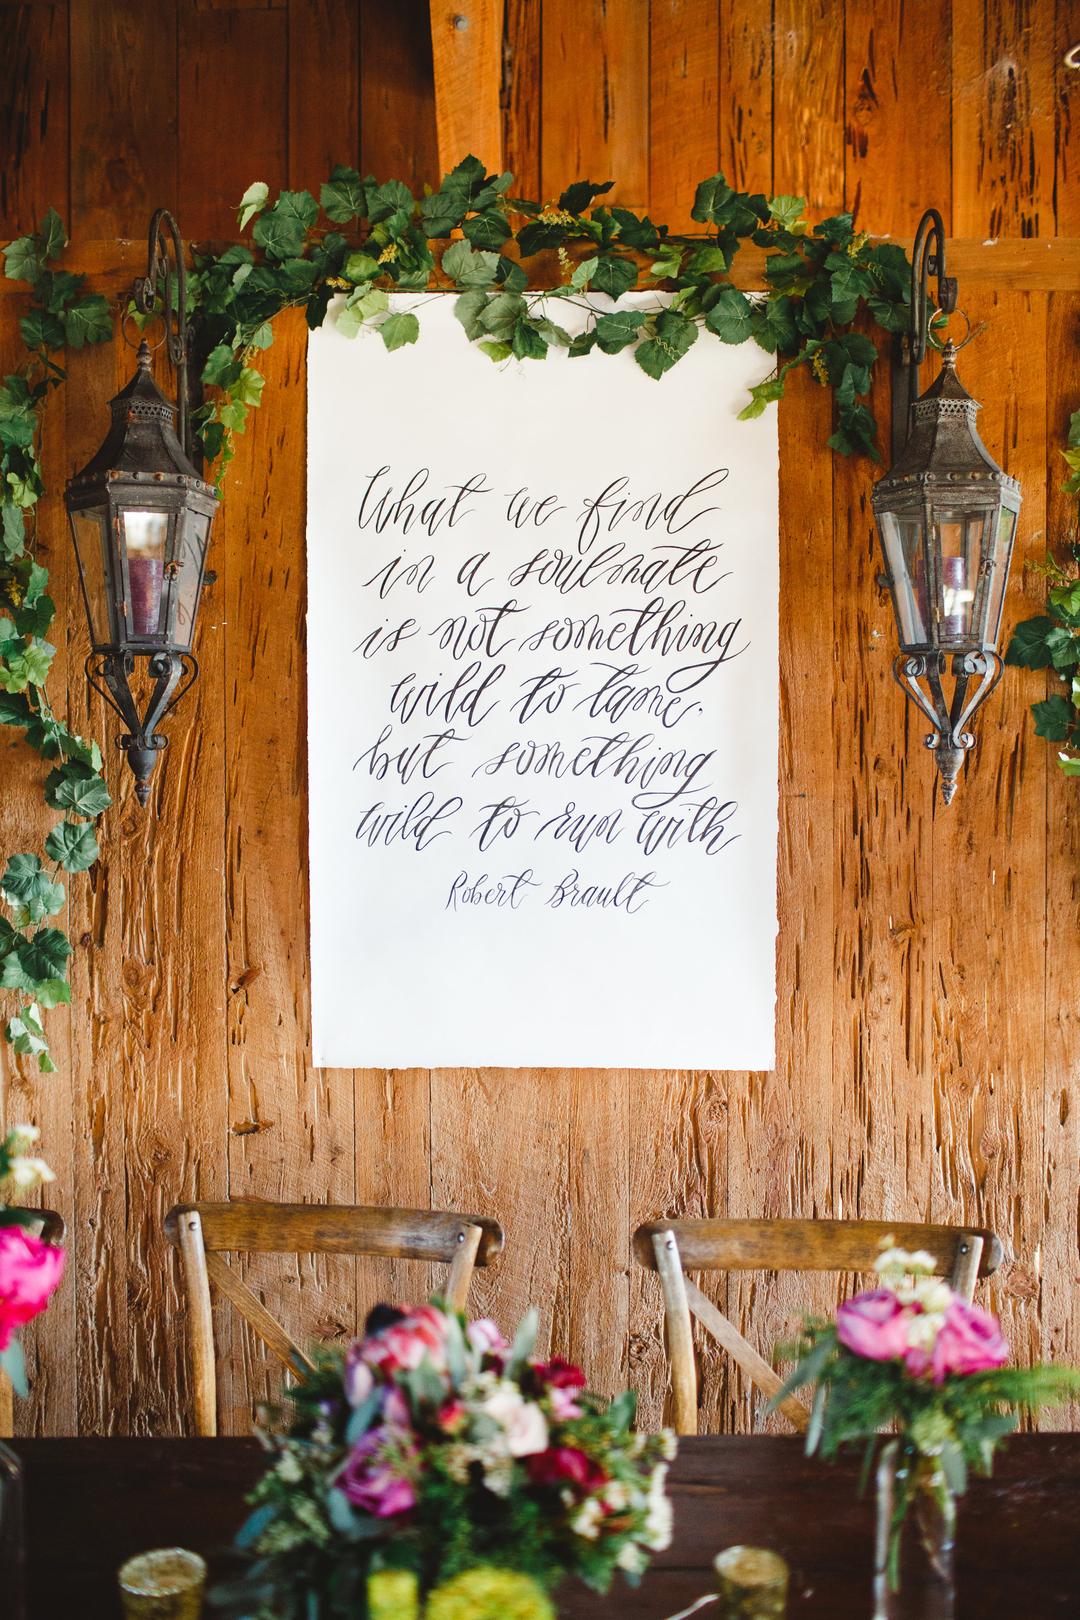 boone-hall-wedding-21.JPG